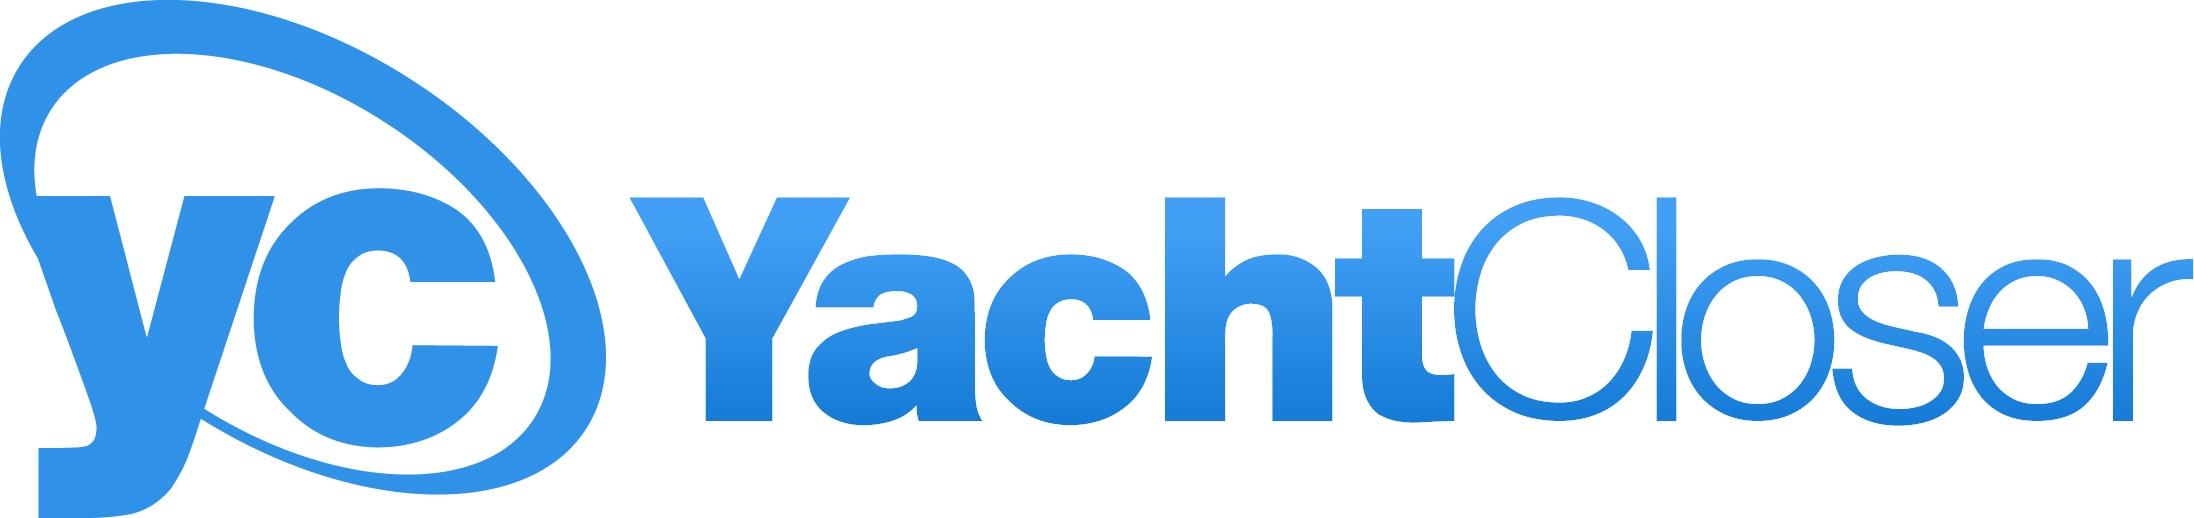 YachtCloser-LOGO-HI_RES_large 2